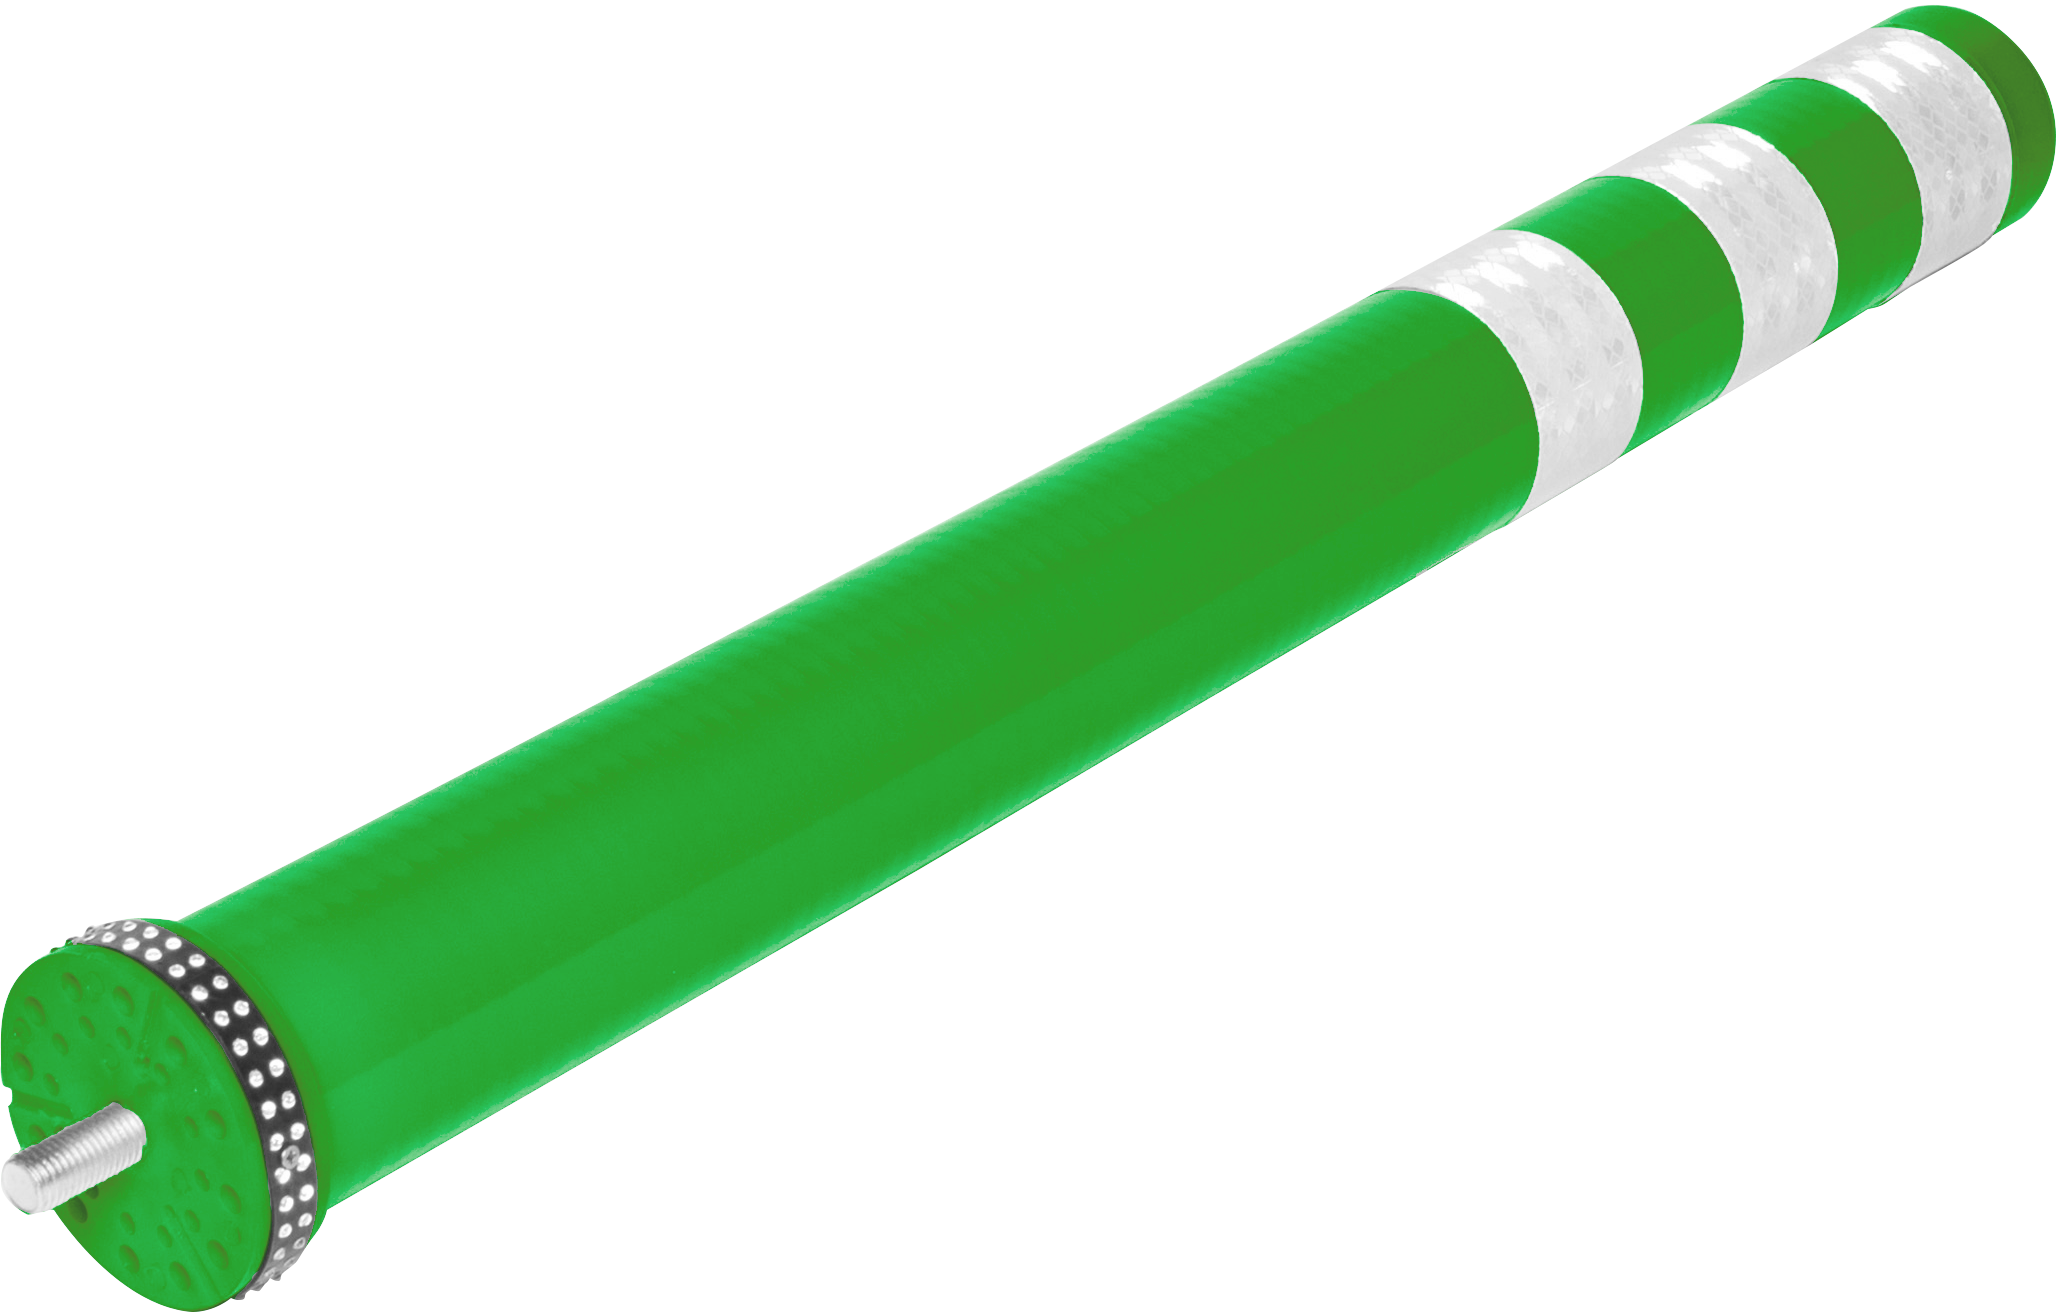 Smartpath flexibele paal groen, diam. 80 mm, H 800 mm